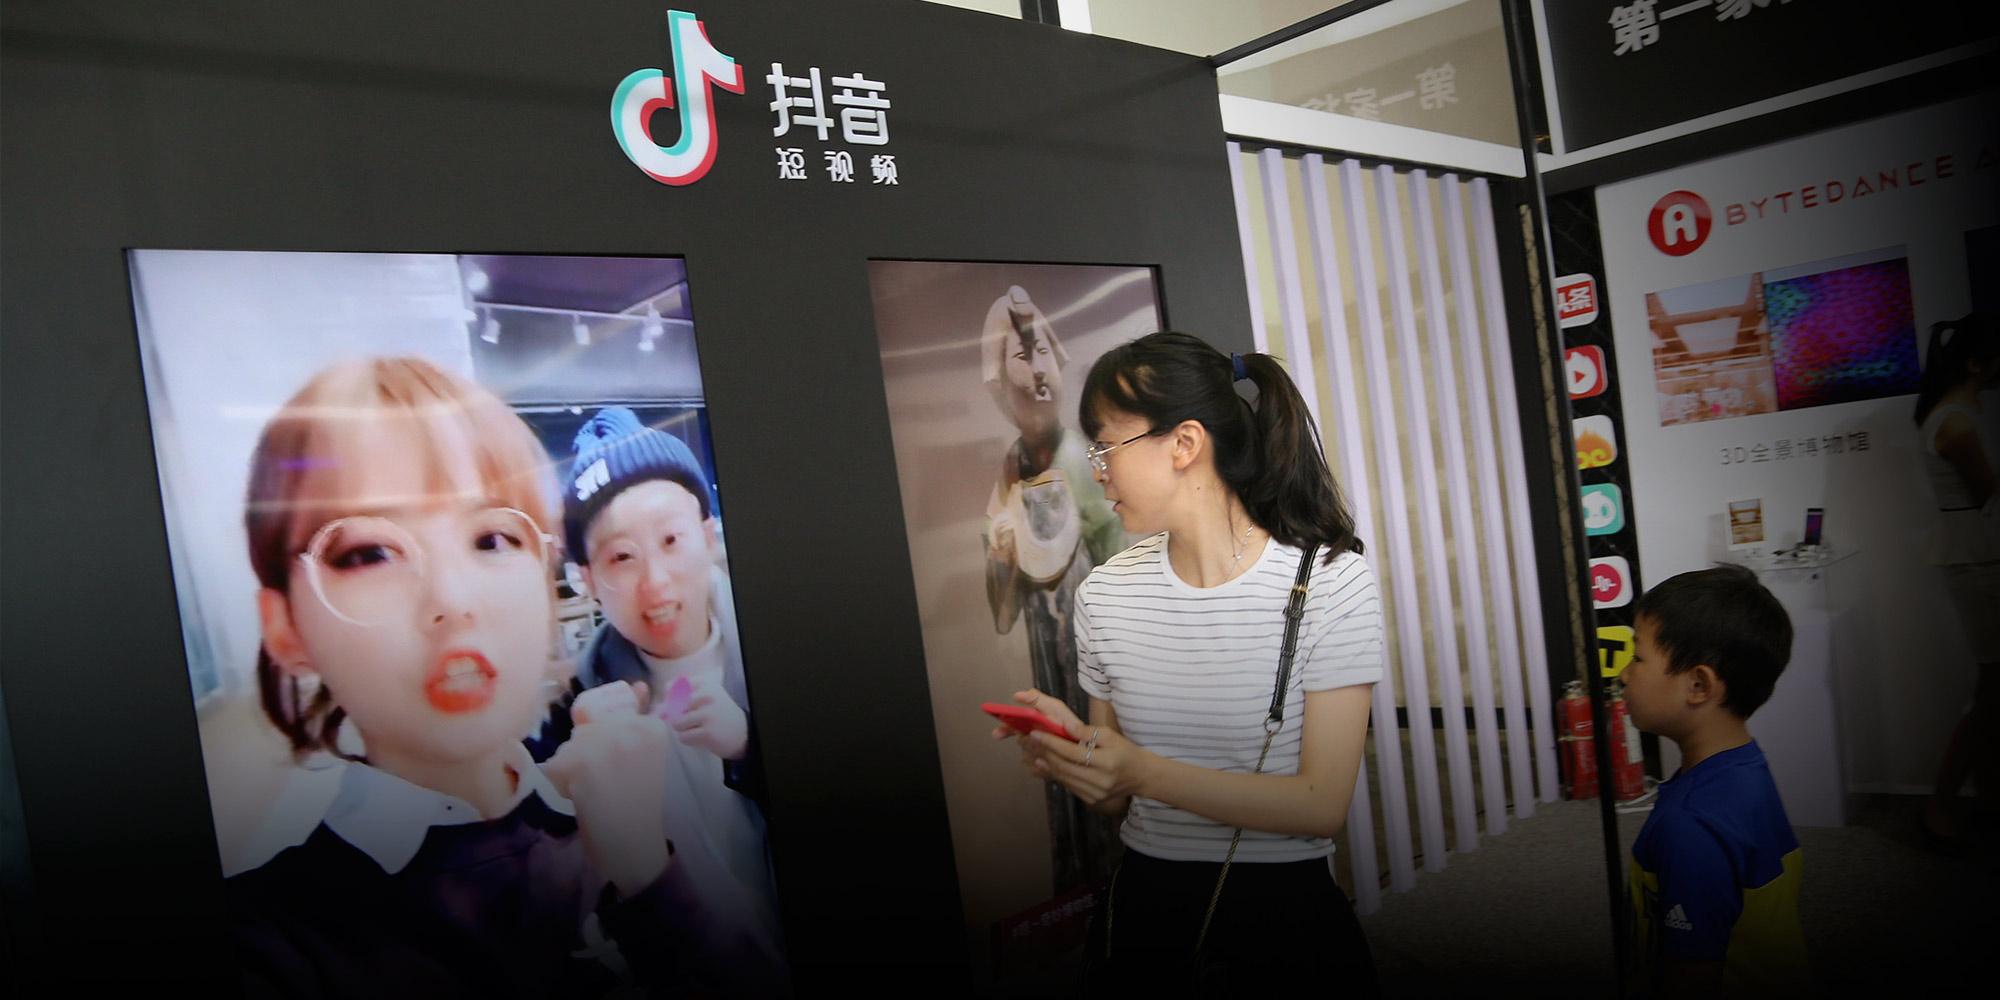 TikTok Videos Are Intellectual Property, Says Beijing Court